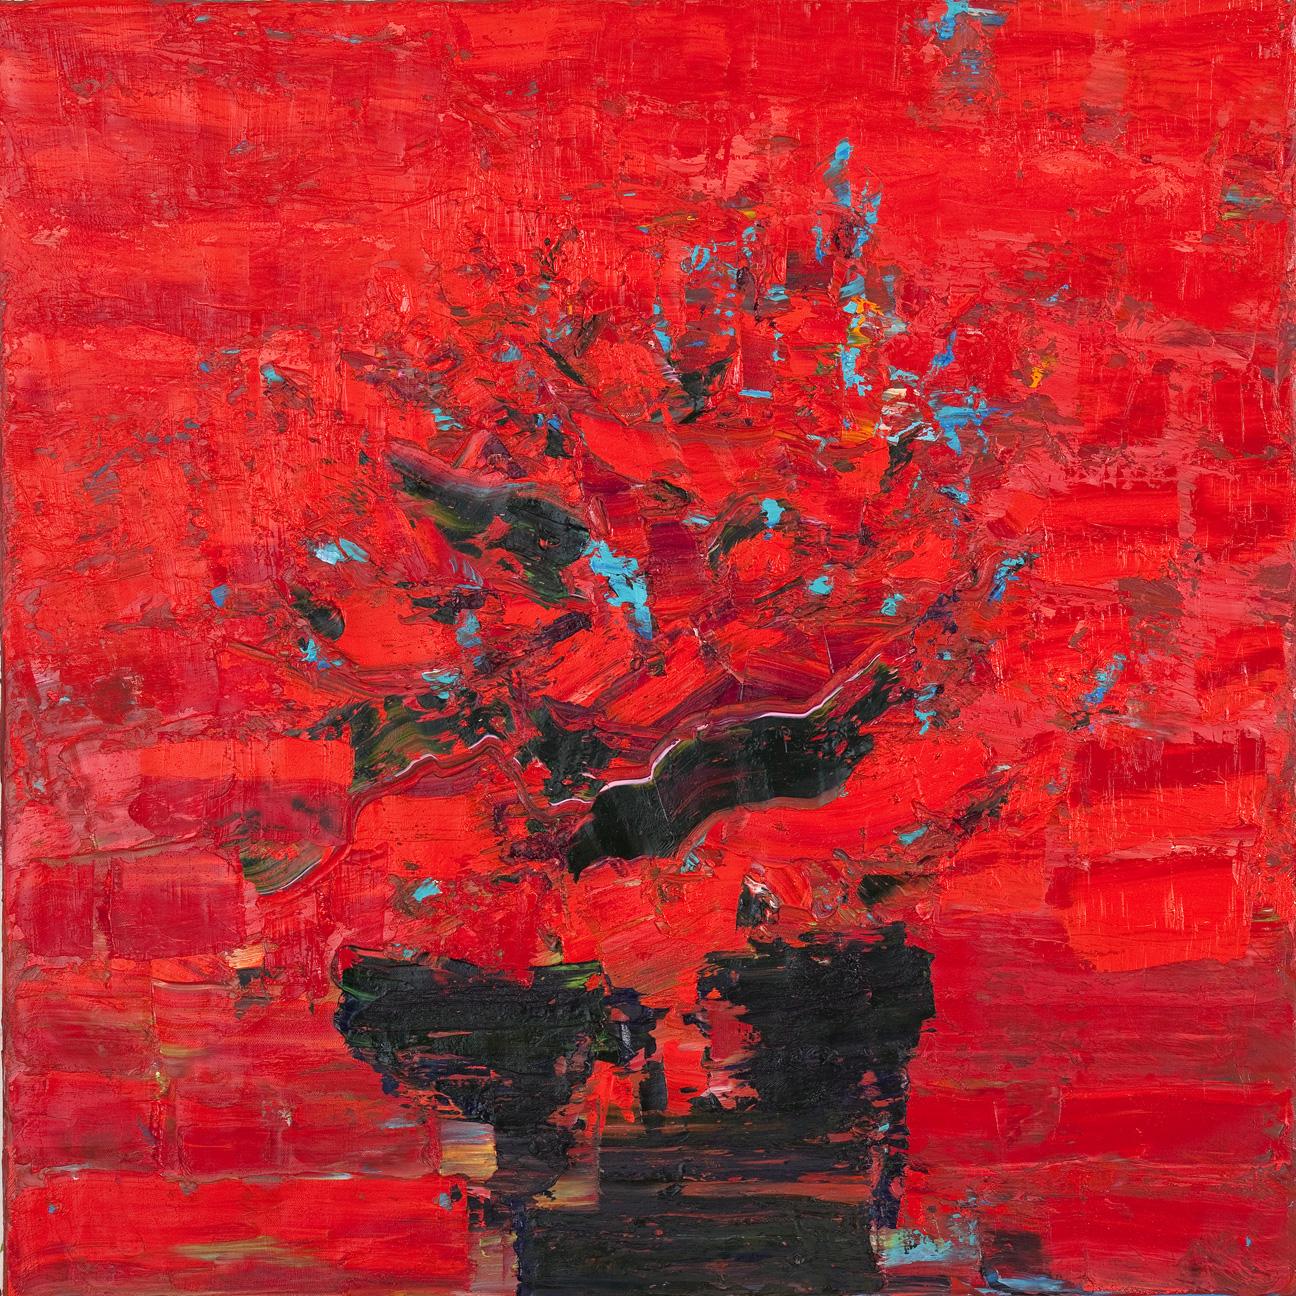 Red Geranium Palace